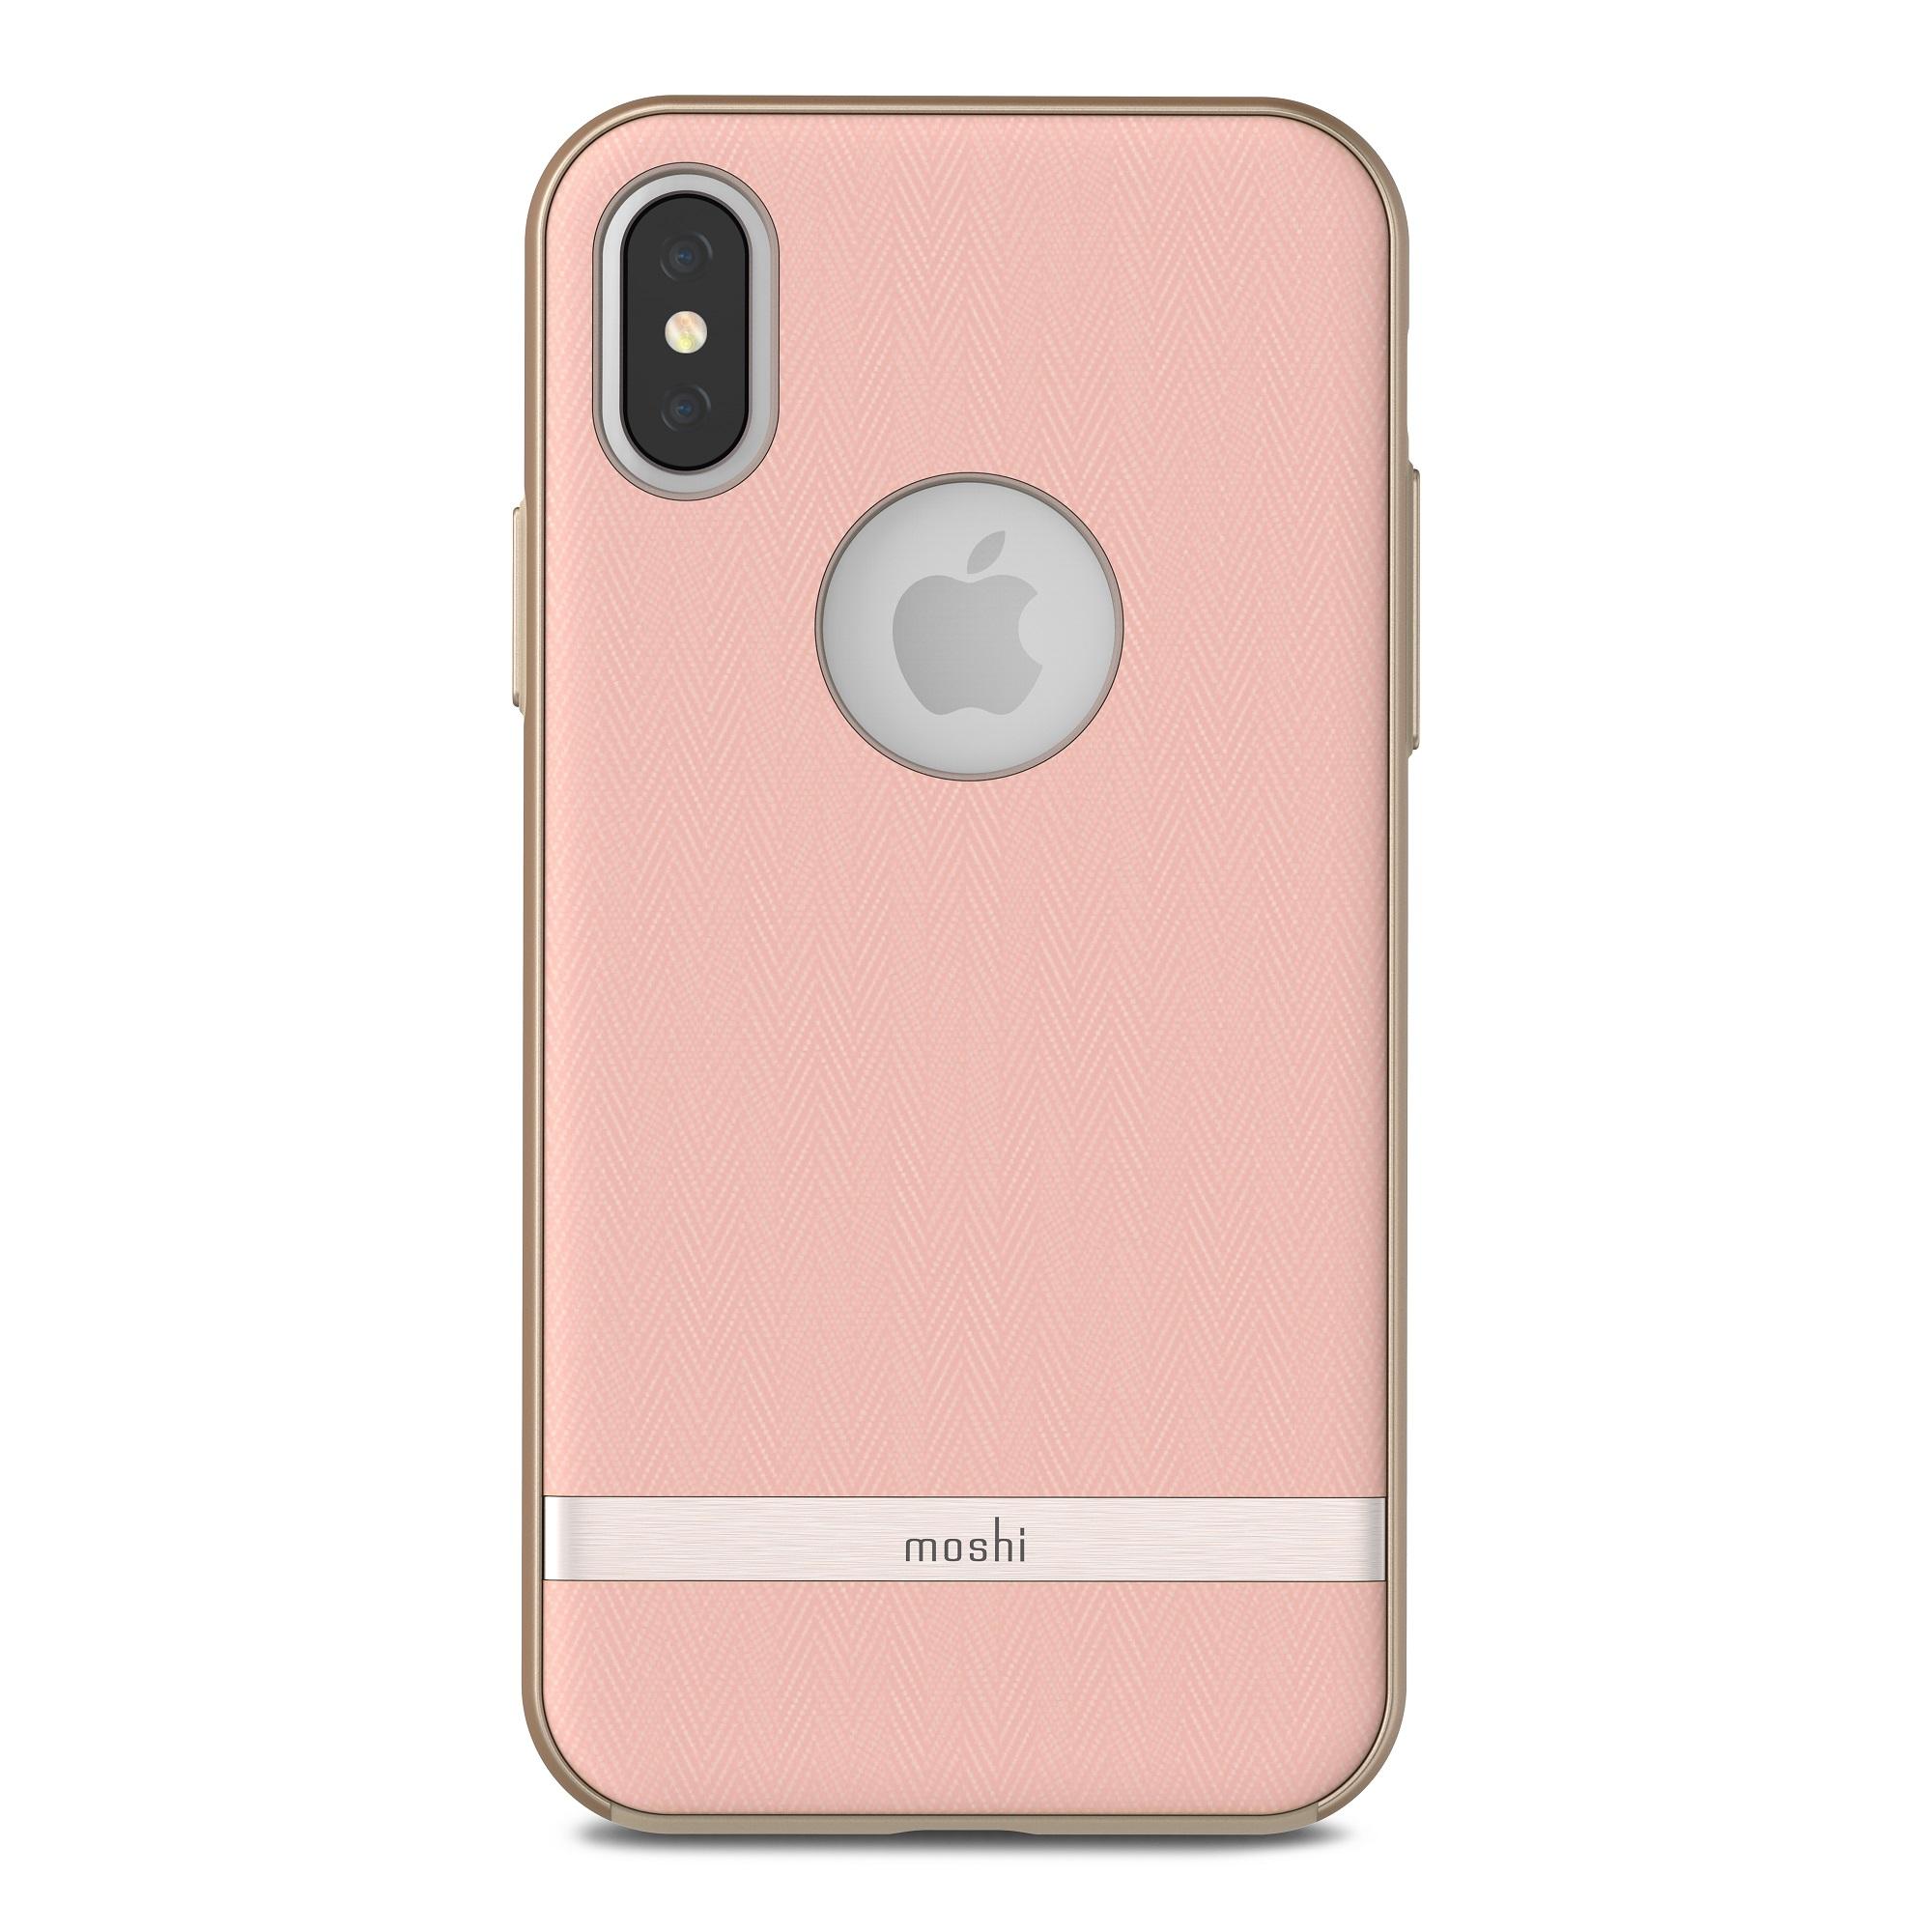 Moshi Vesta for iPhone XS/X